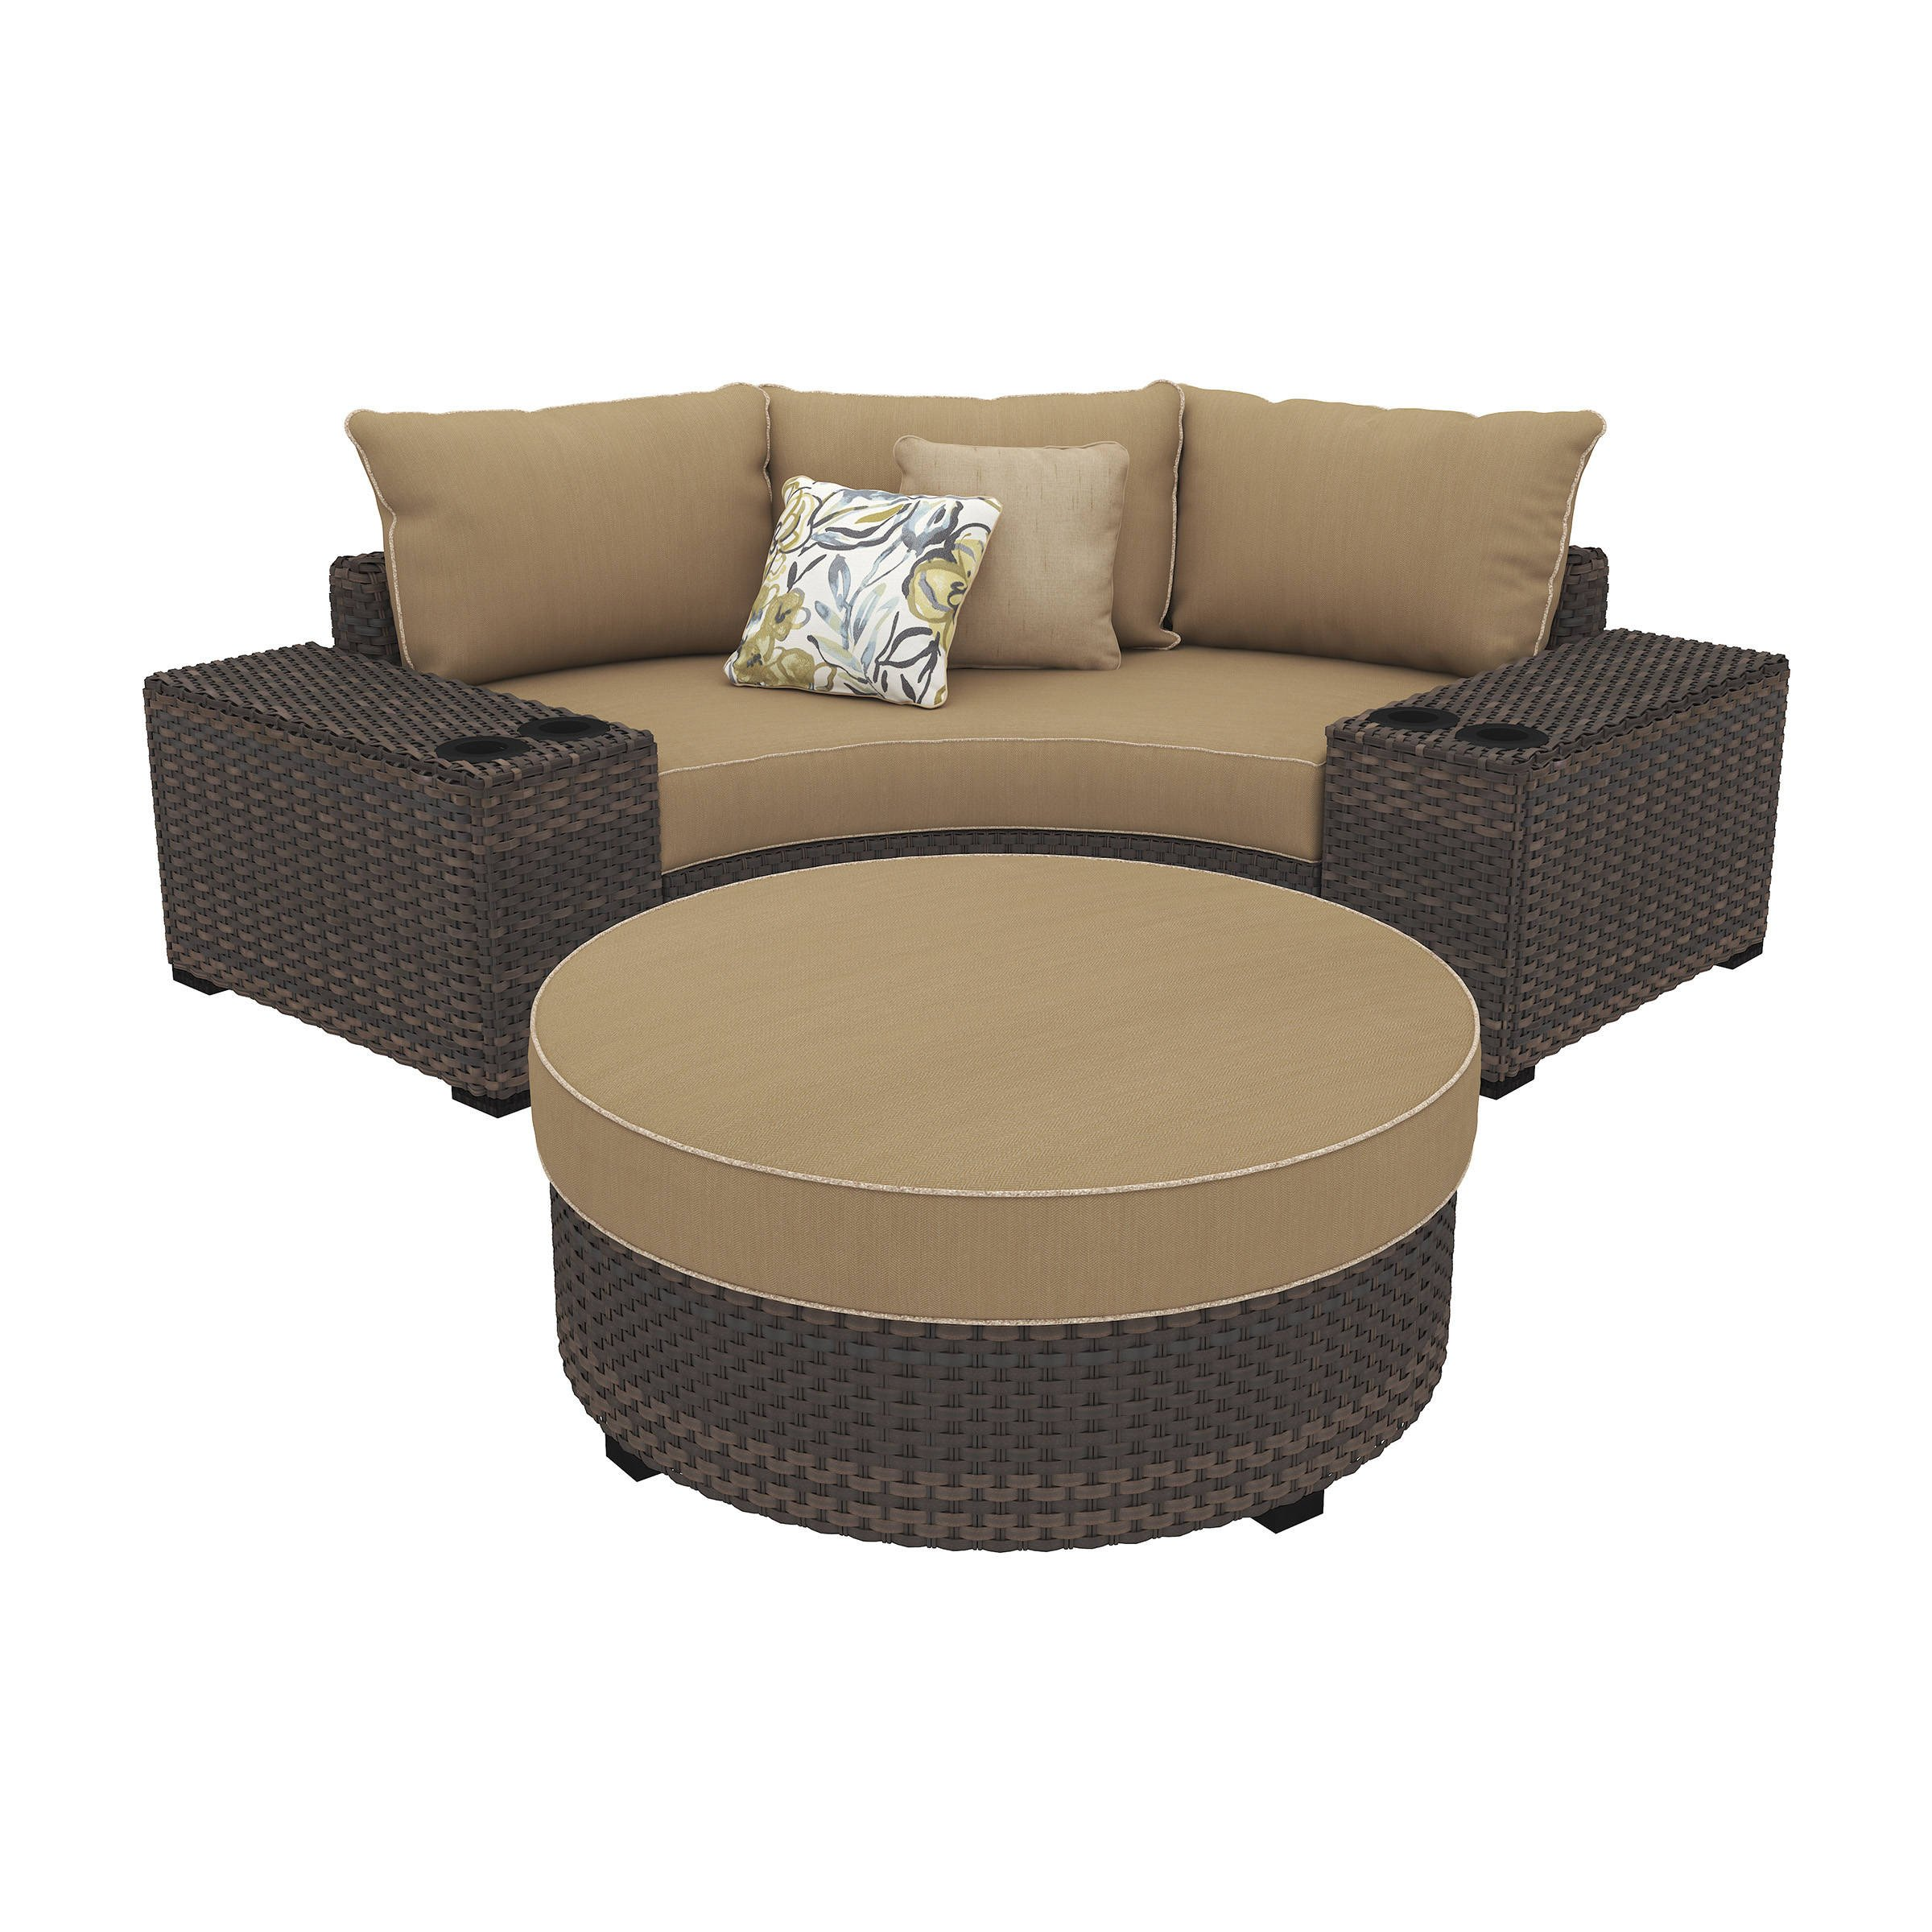 Ashley Porter Bedroom Set Awesome ashley Furniture Spring Ridge Beige Corner Chair and Ottoman